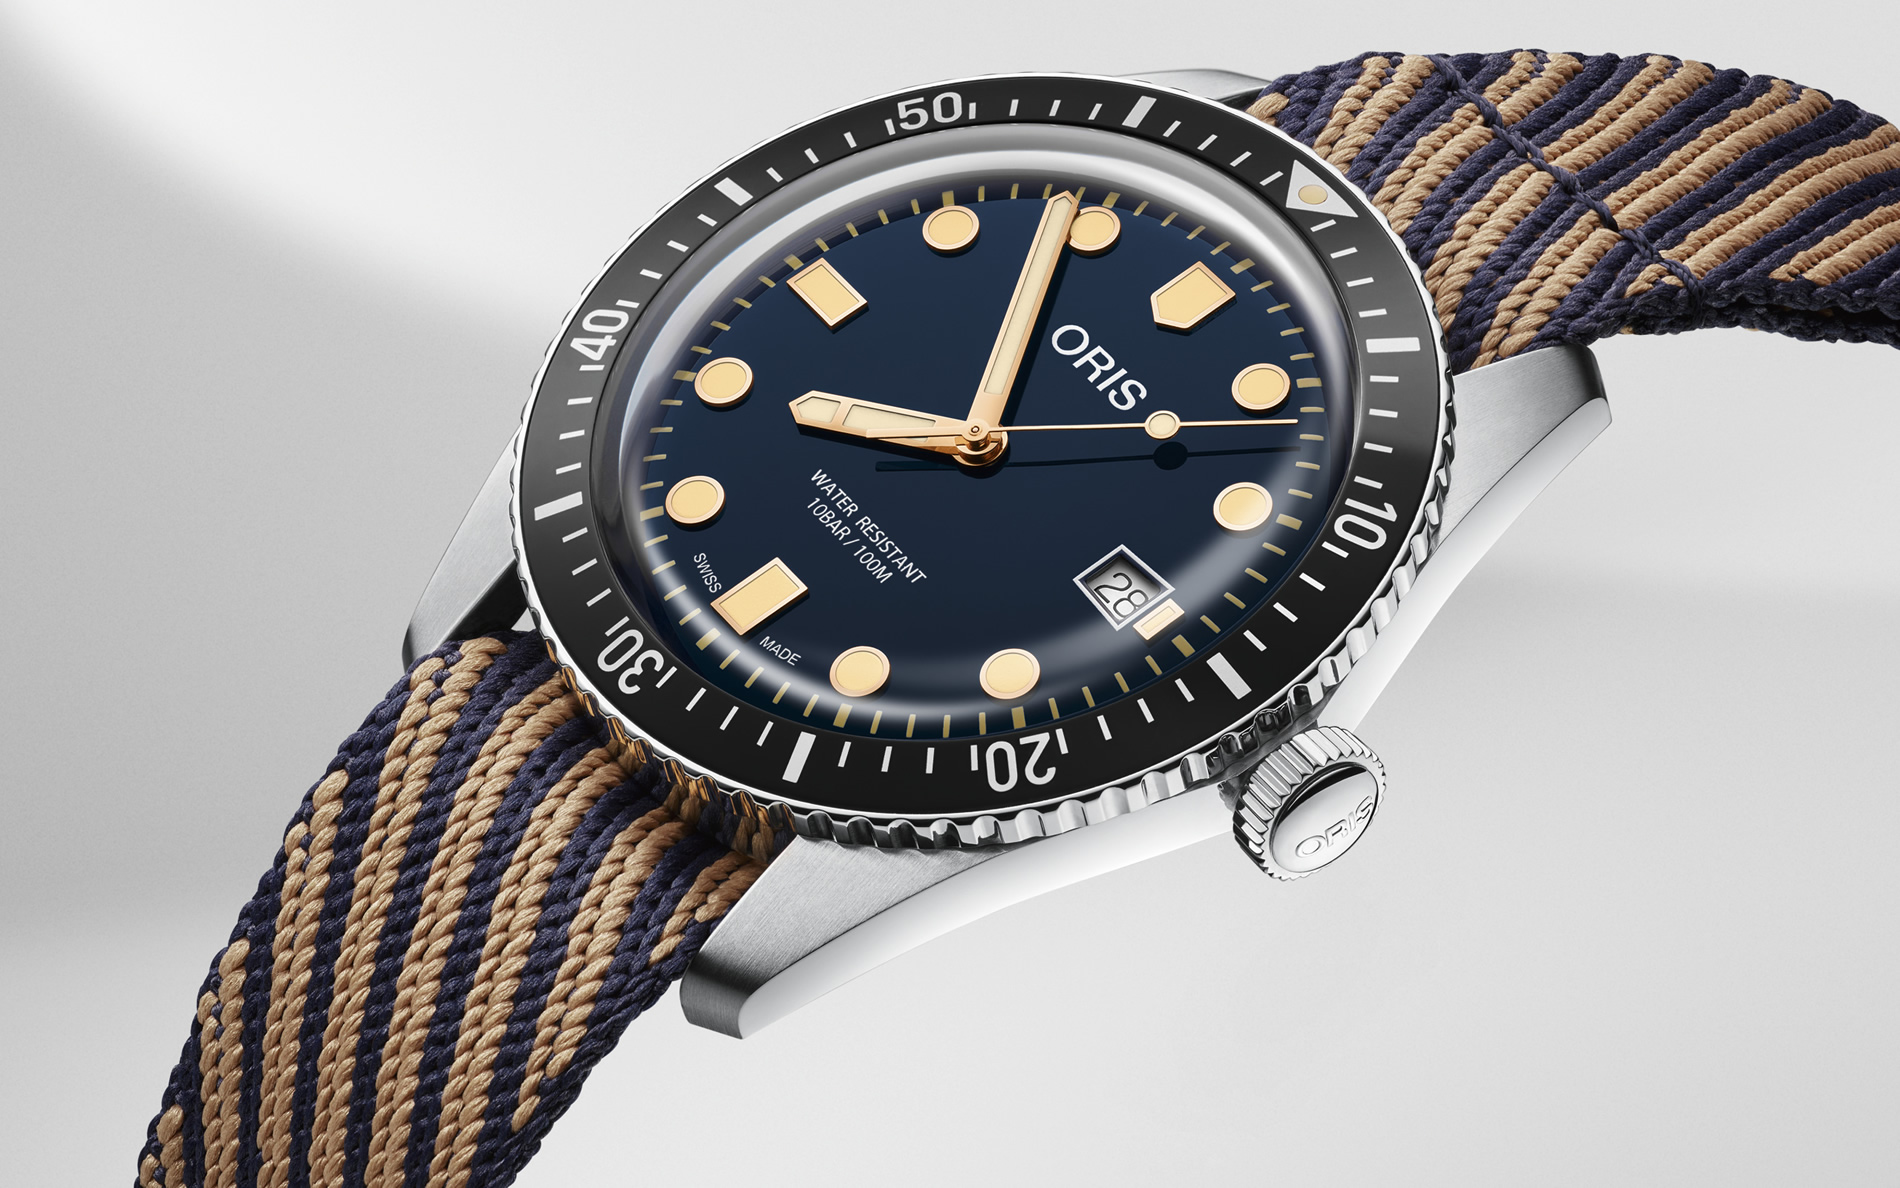 01-733-7720-4035-07-5-21-13-Oris-Divers-